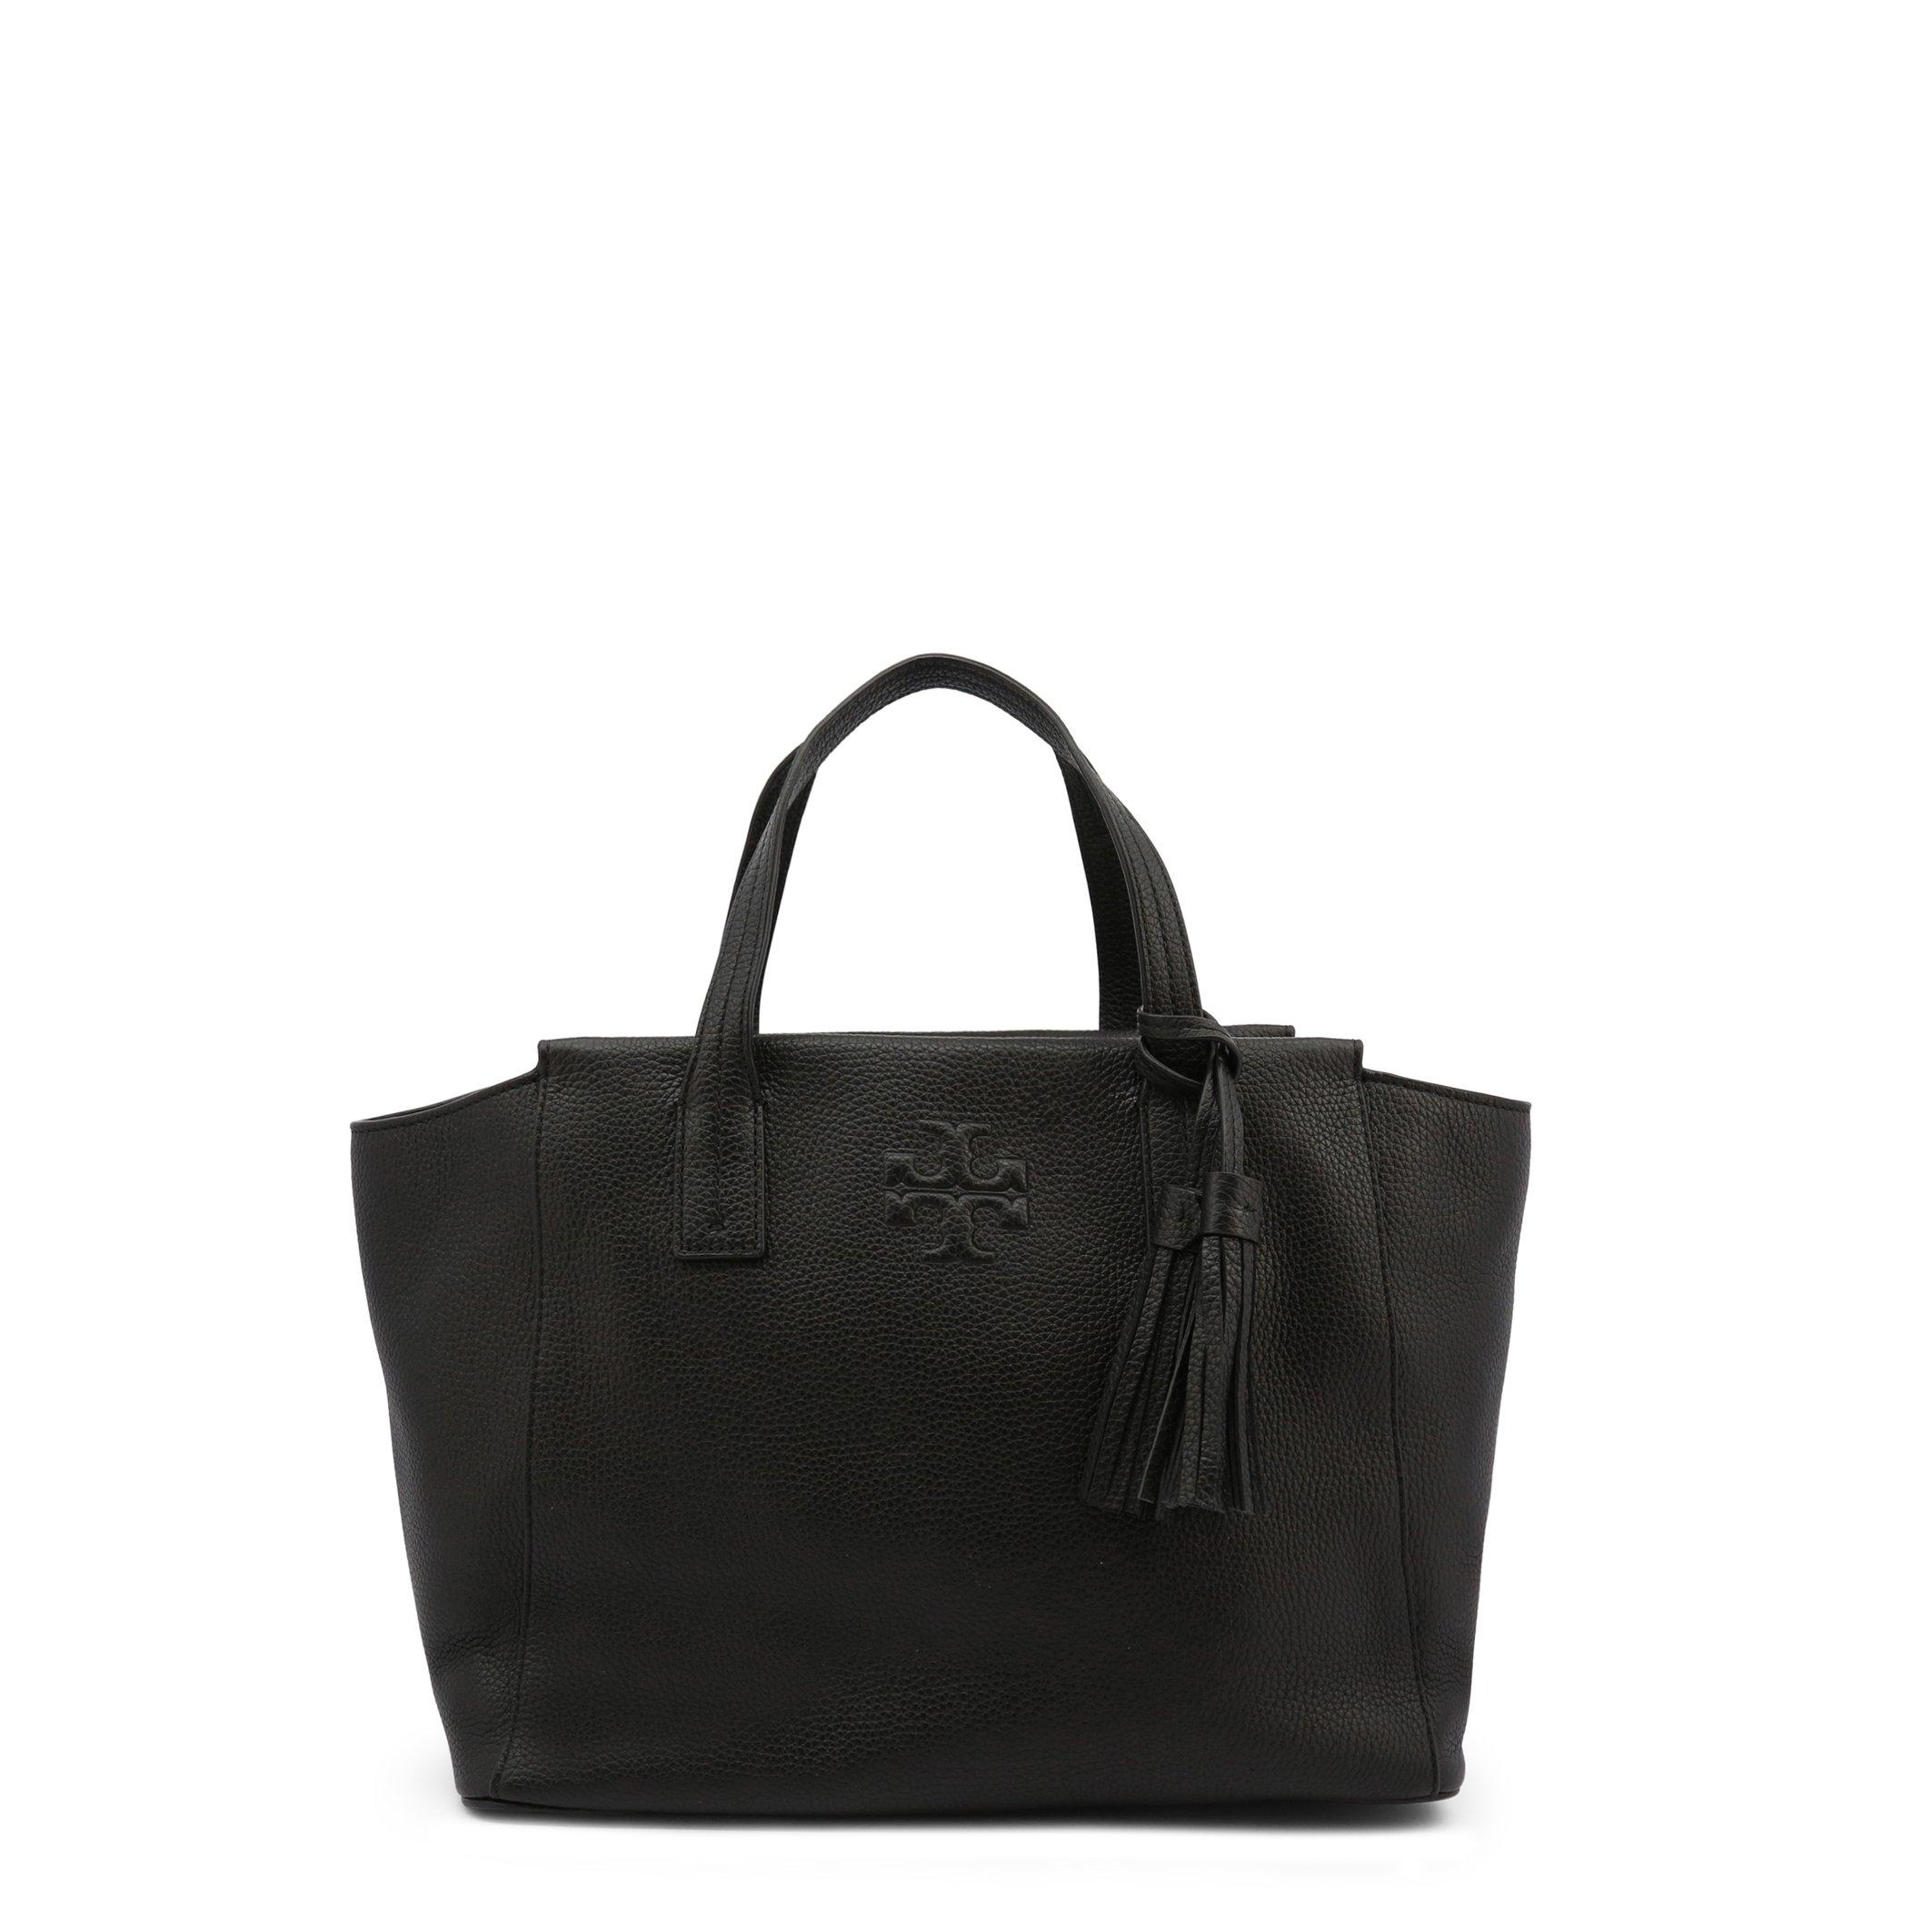 Tory Burch Women's Handbag Various Colours 77163 - black NOSIZE